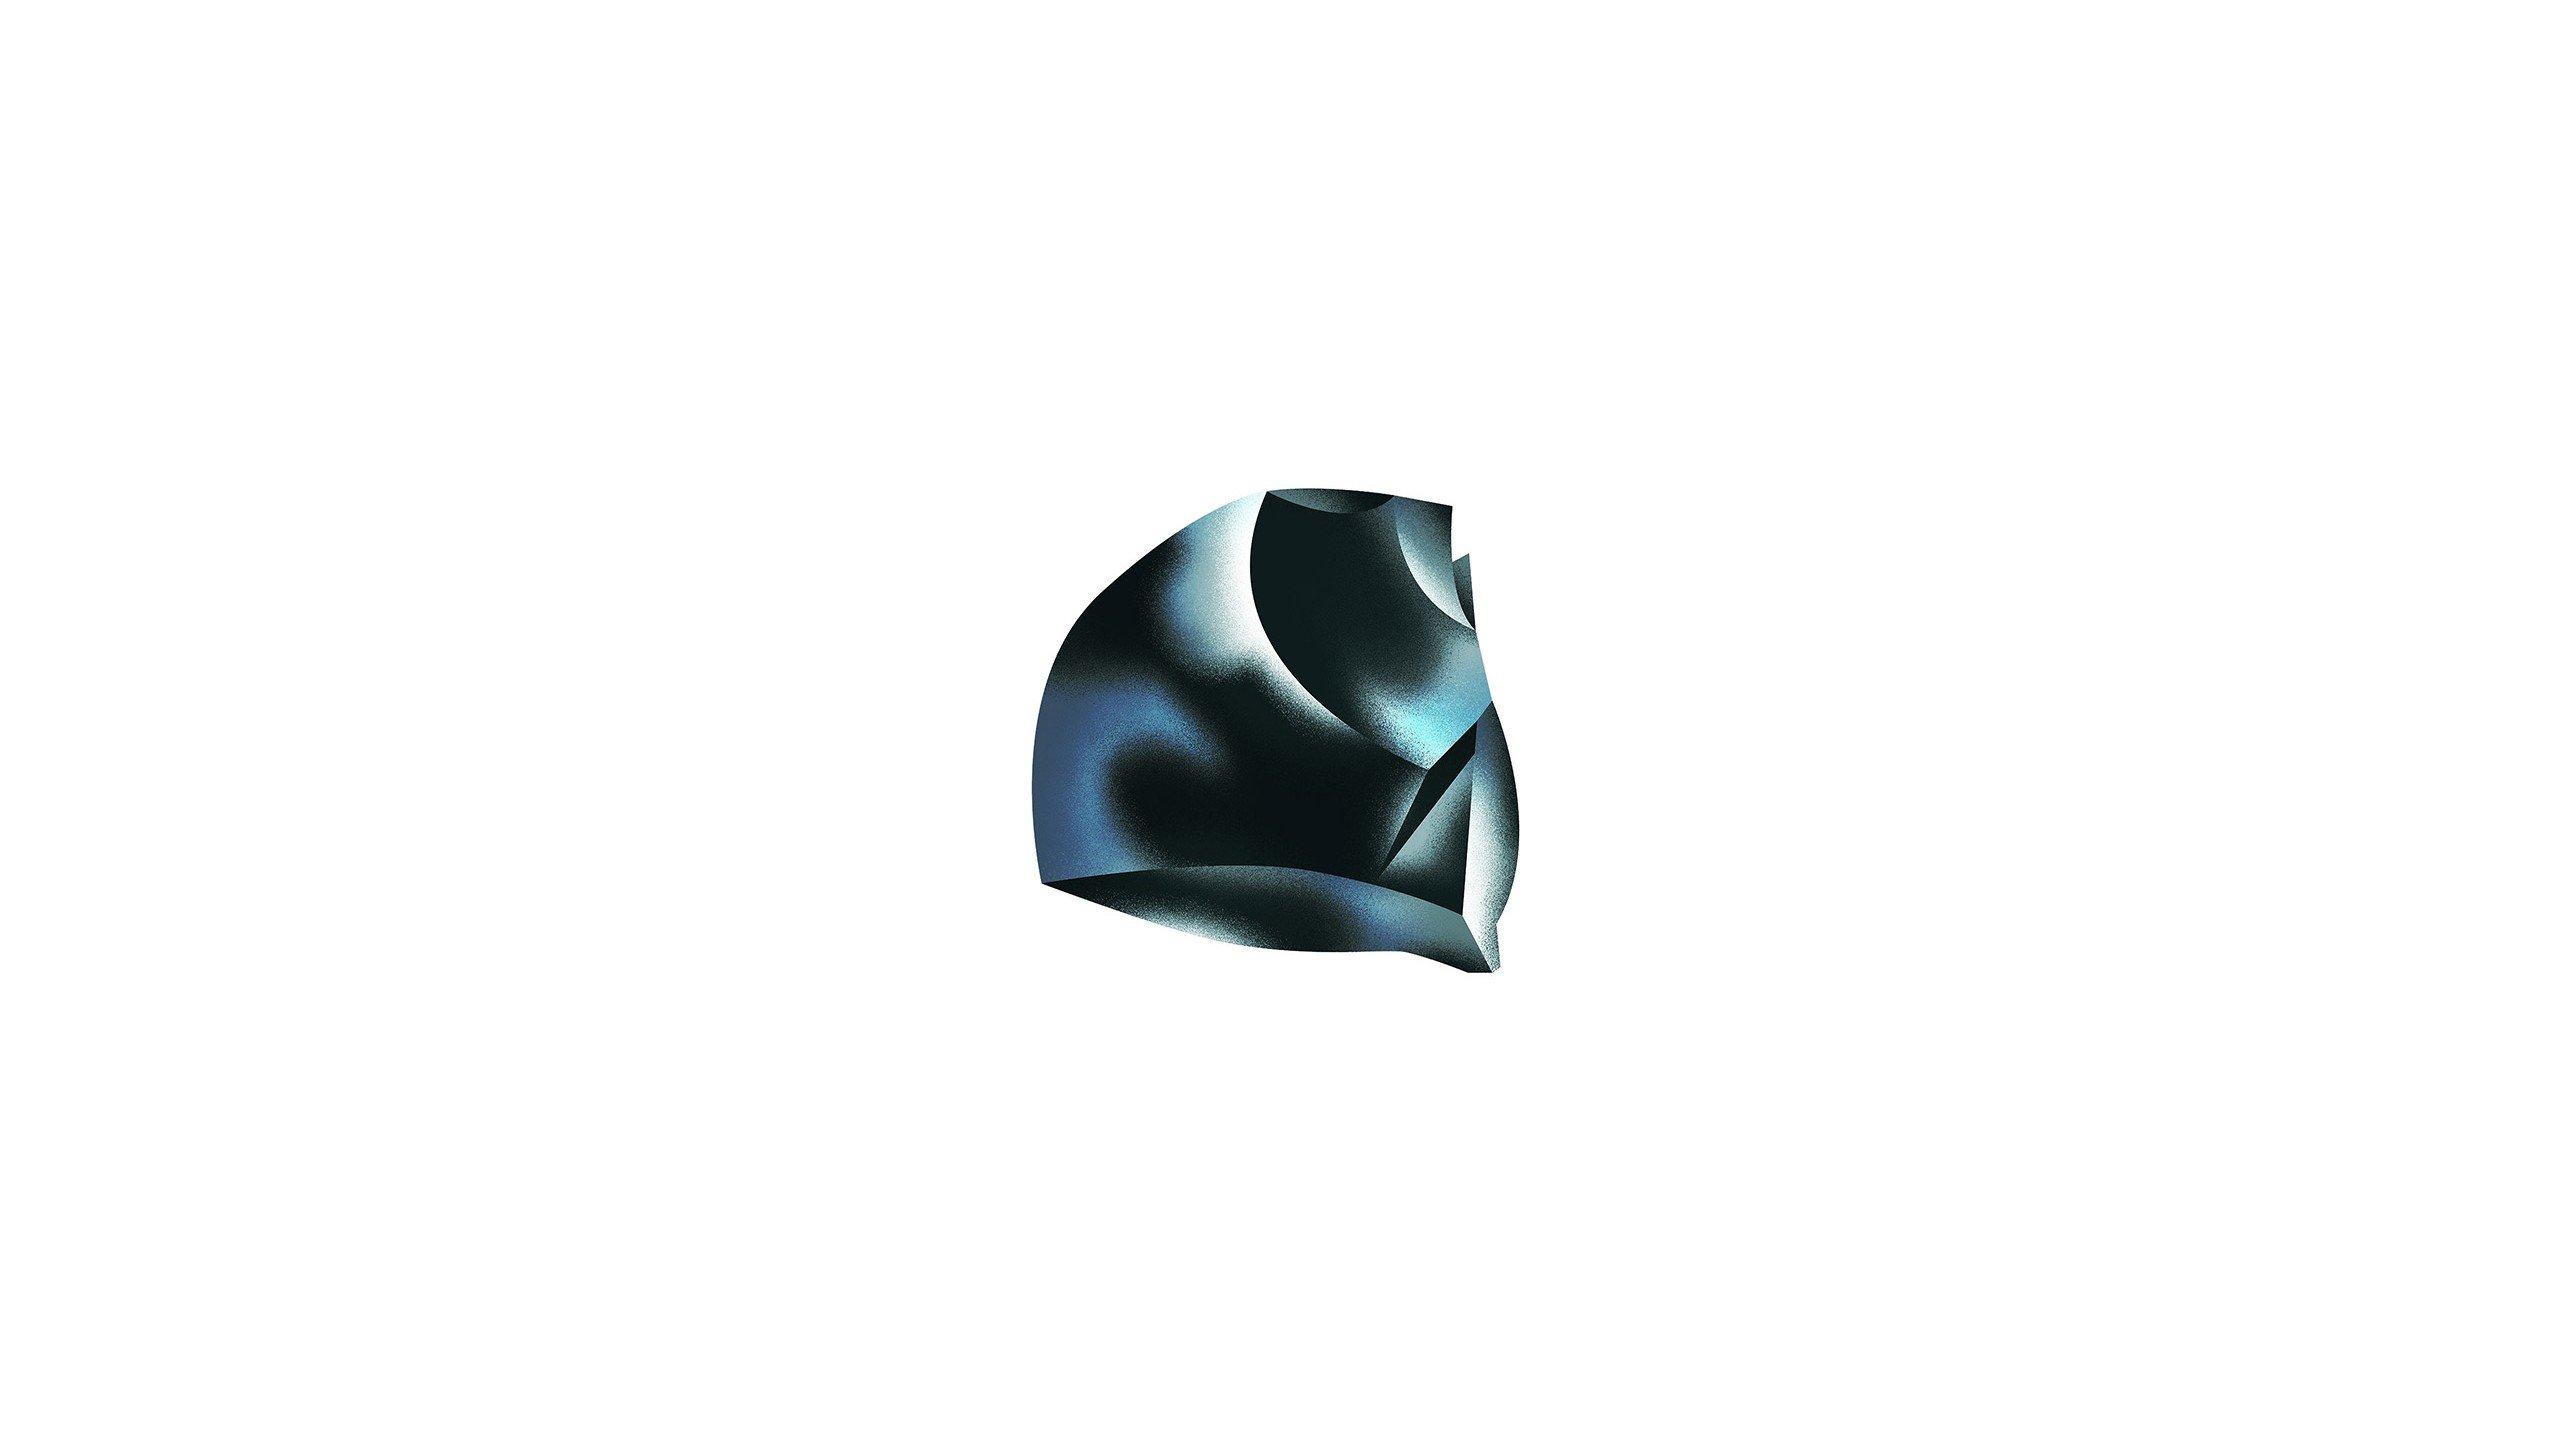 Fond Décran 2560x1440 Px Illustration Obsidienne Fond